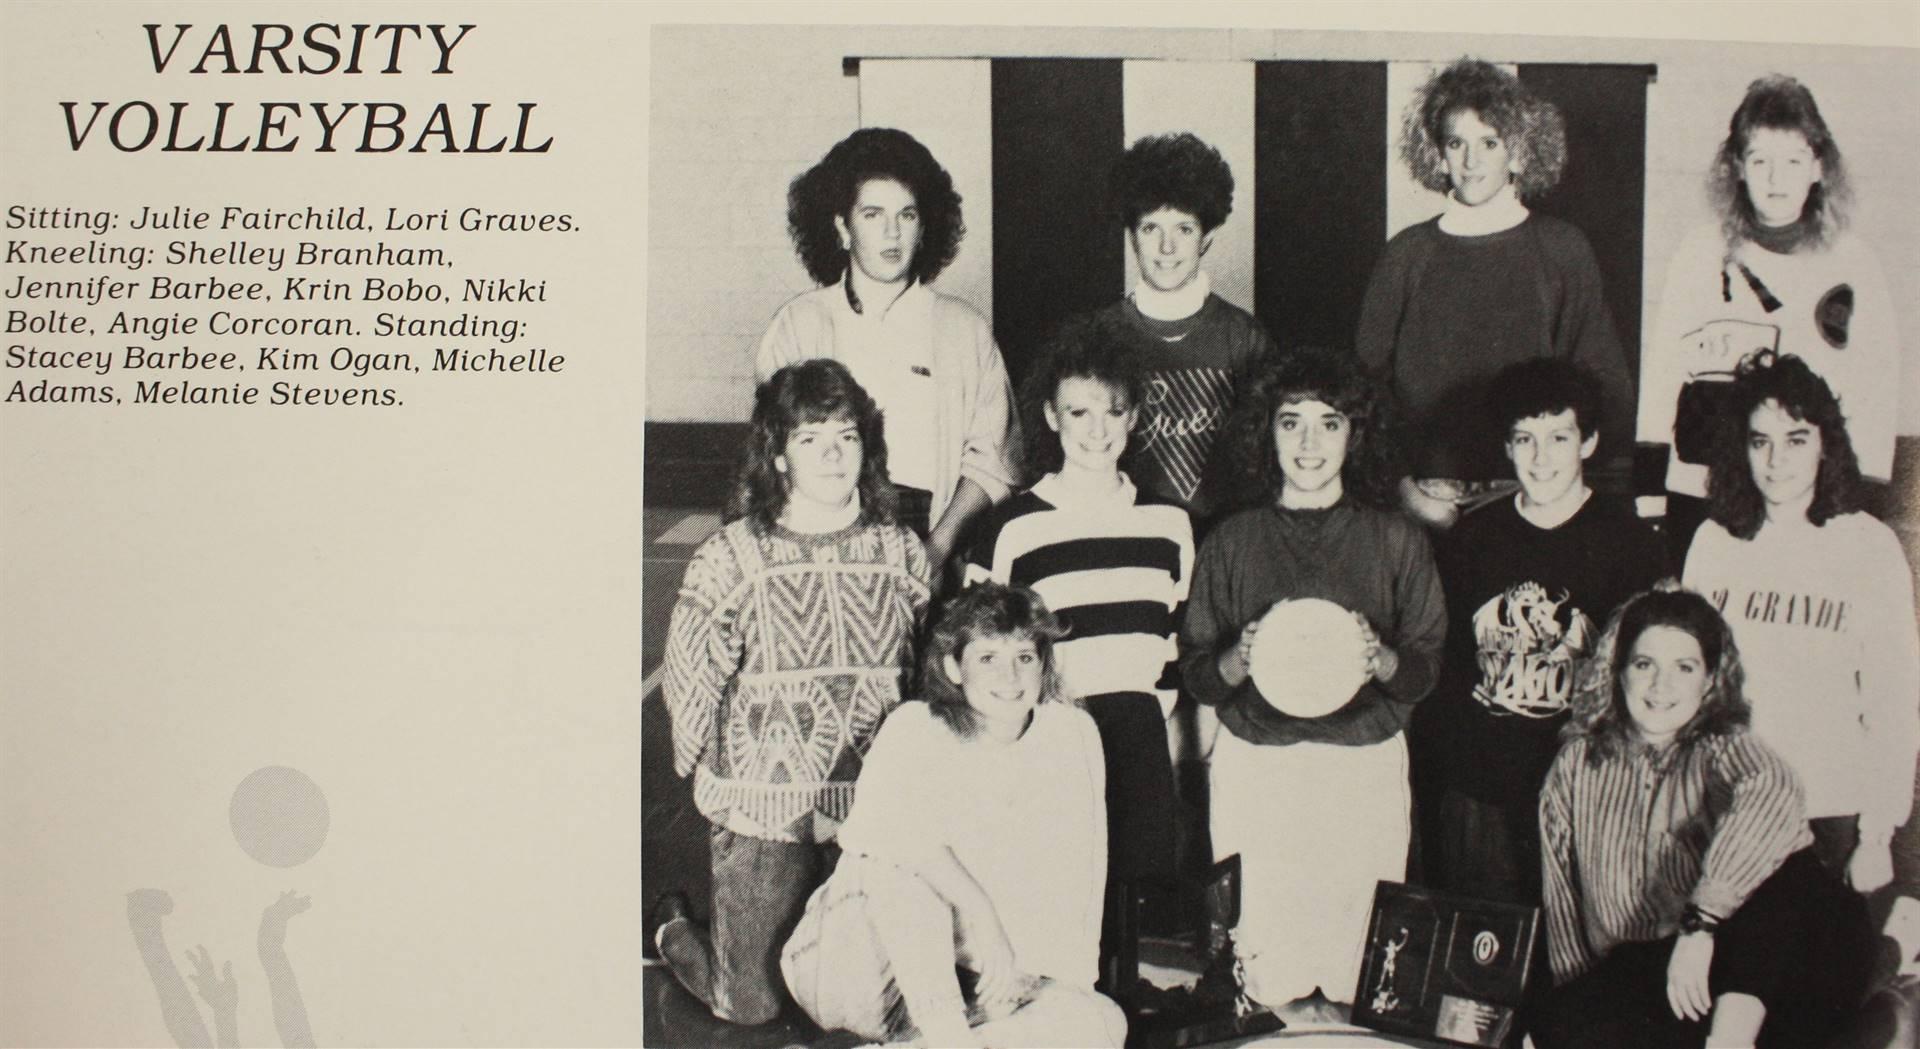 1990 Varsity Volleyball